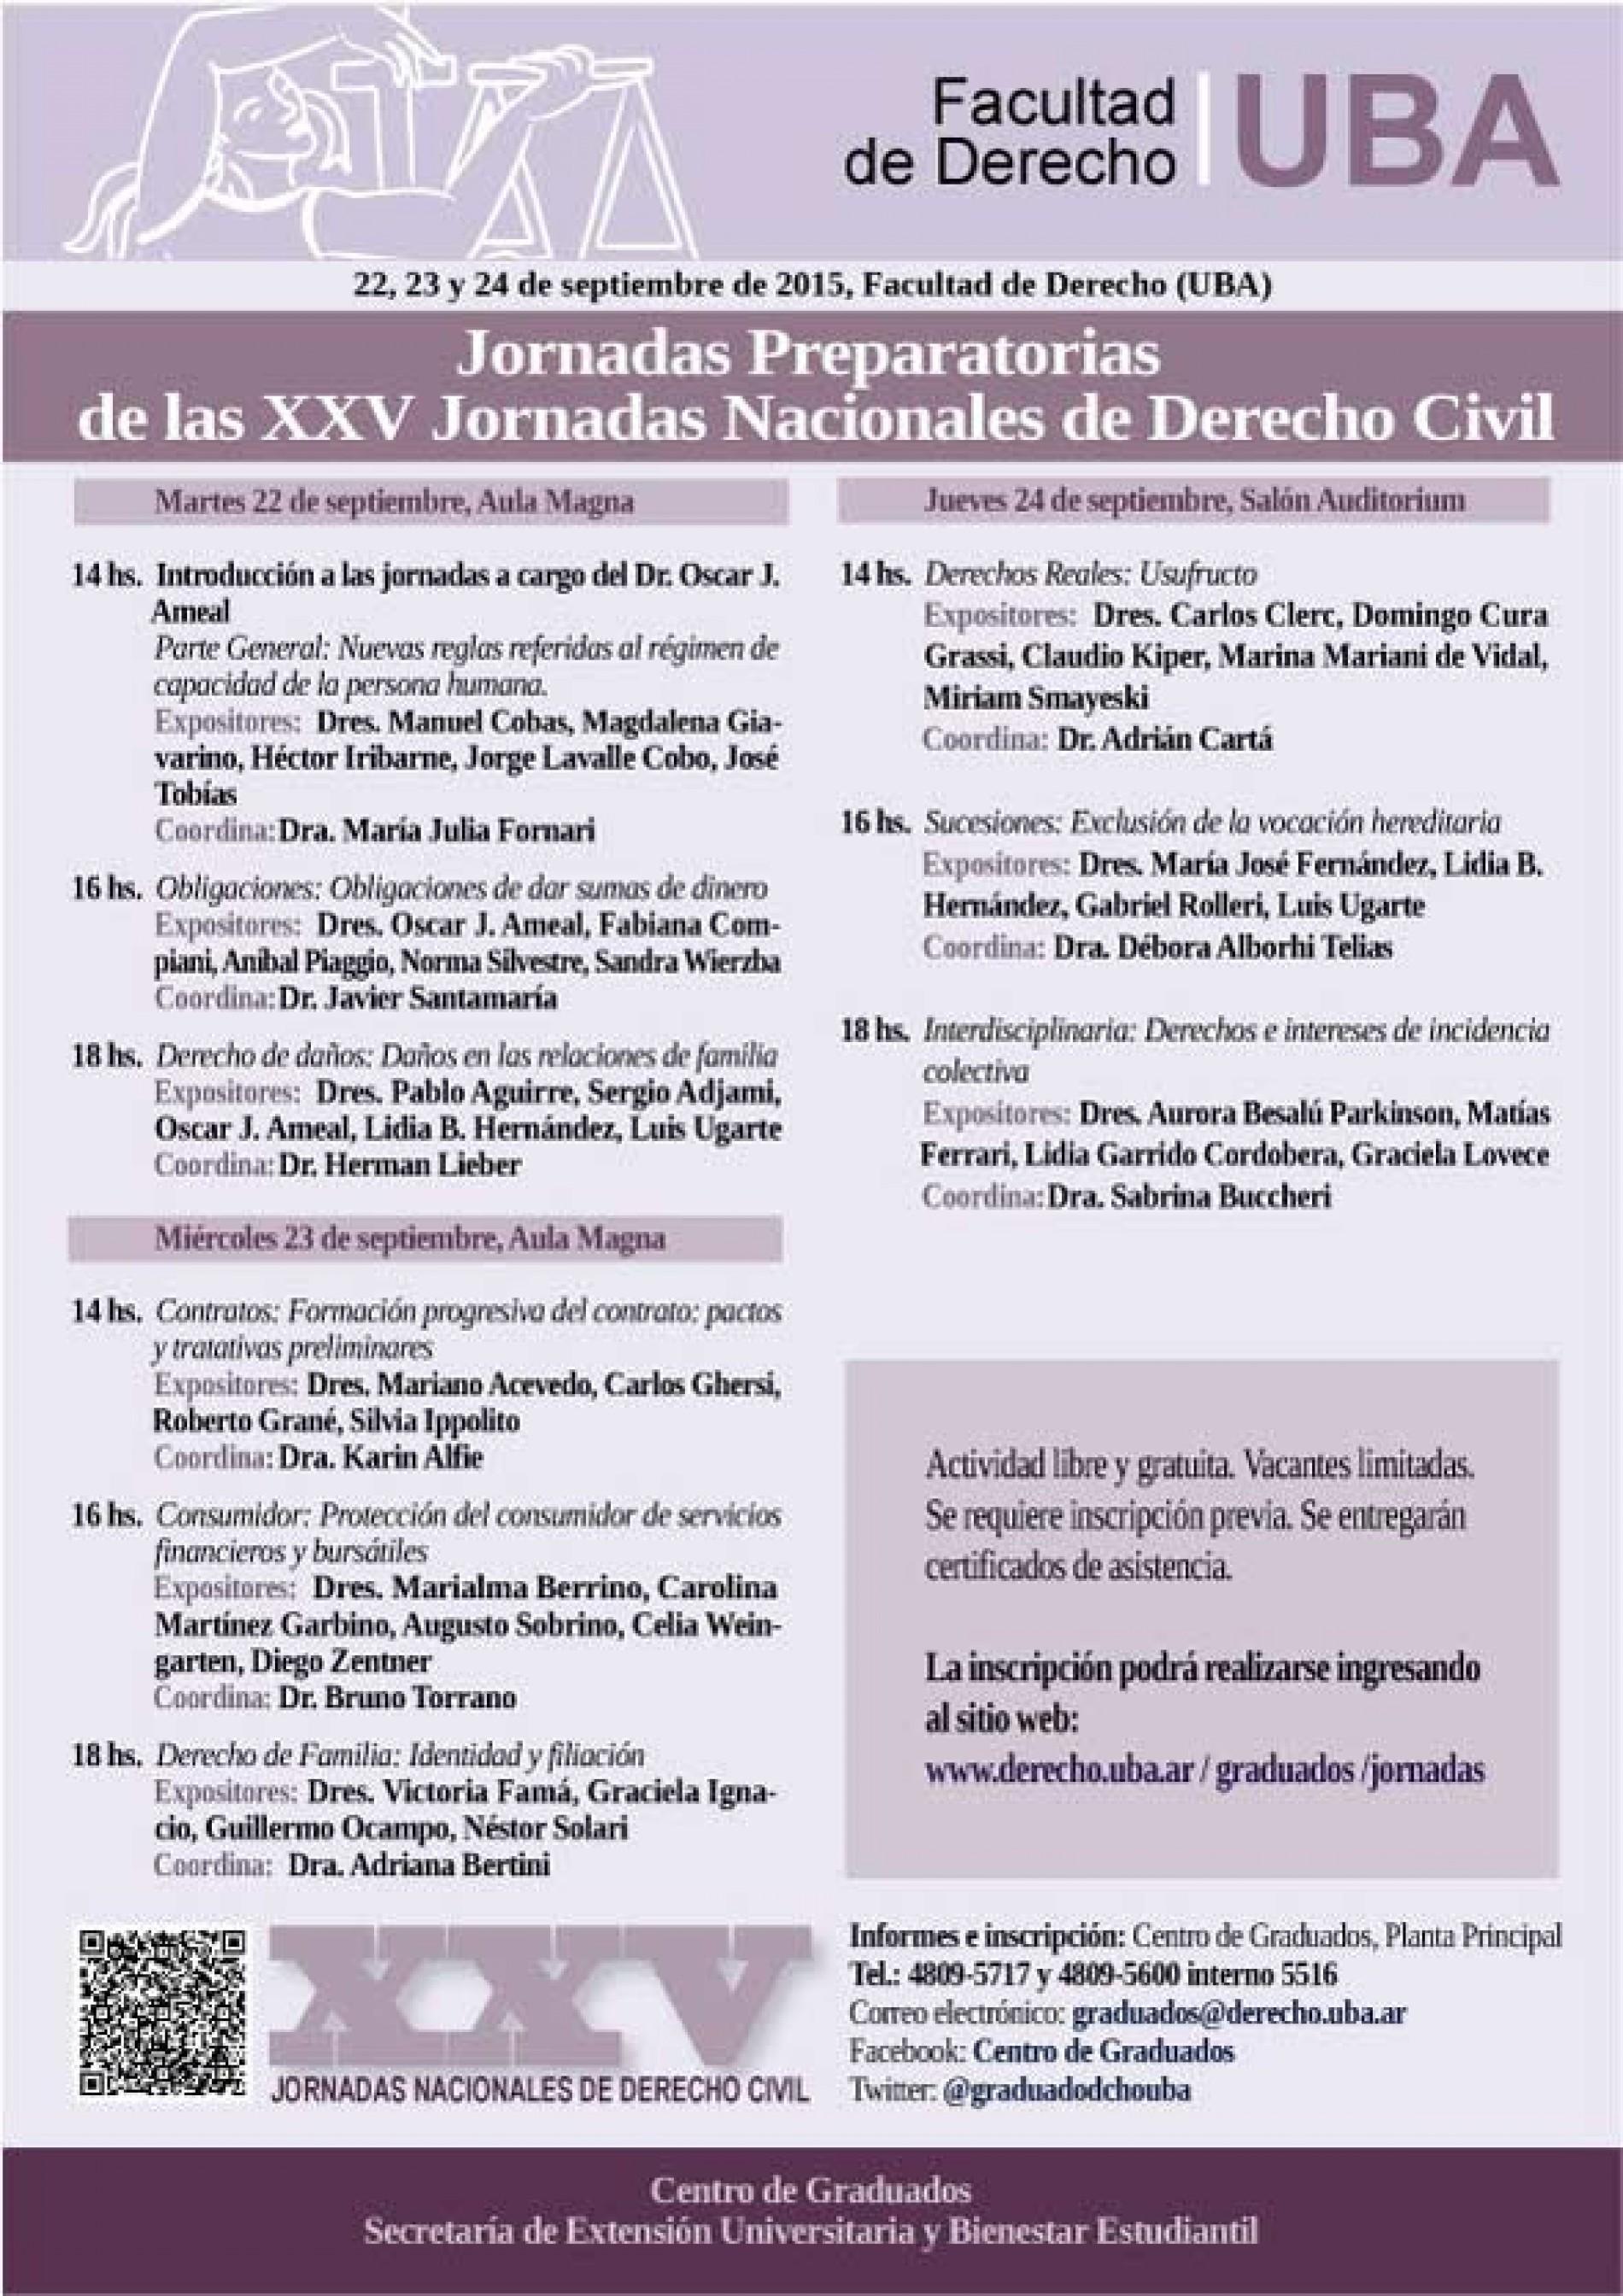 Jornadas Preparatorias de las XXV Jornadas Nacionales de Derecho Civil